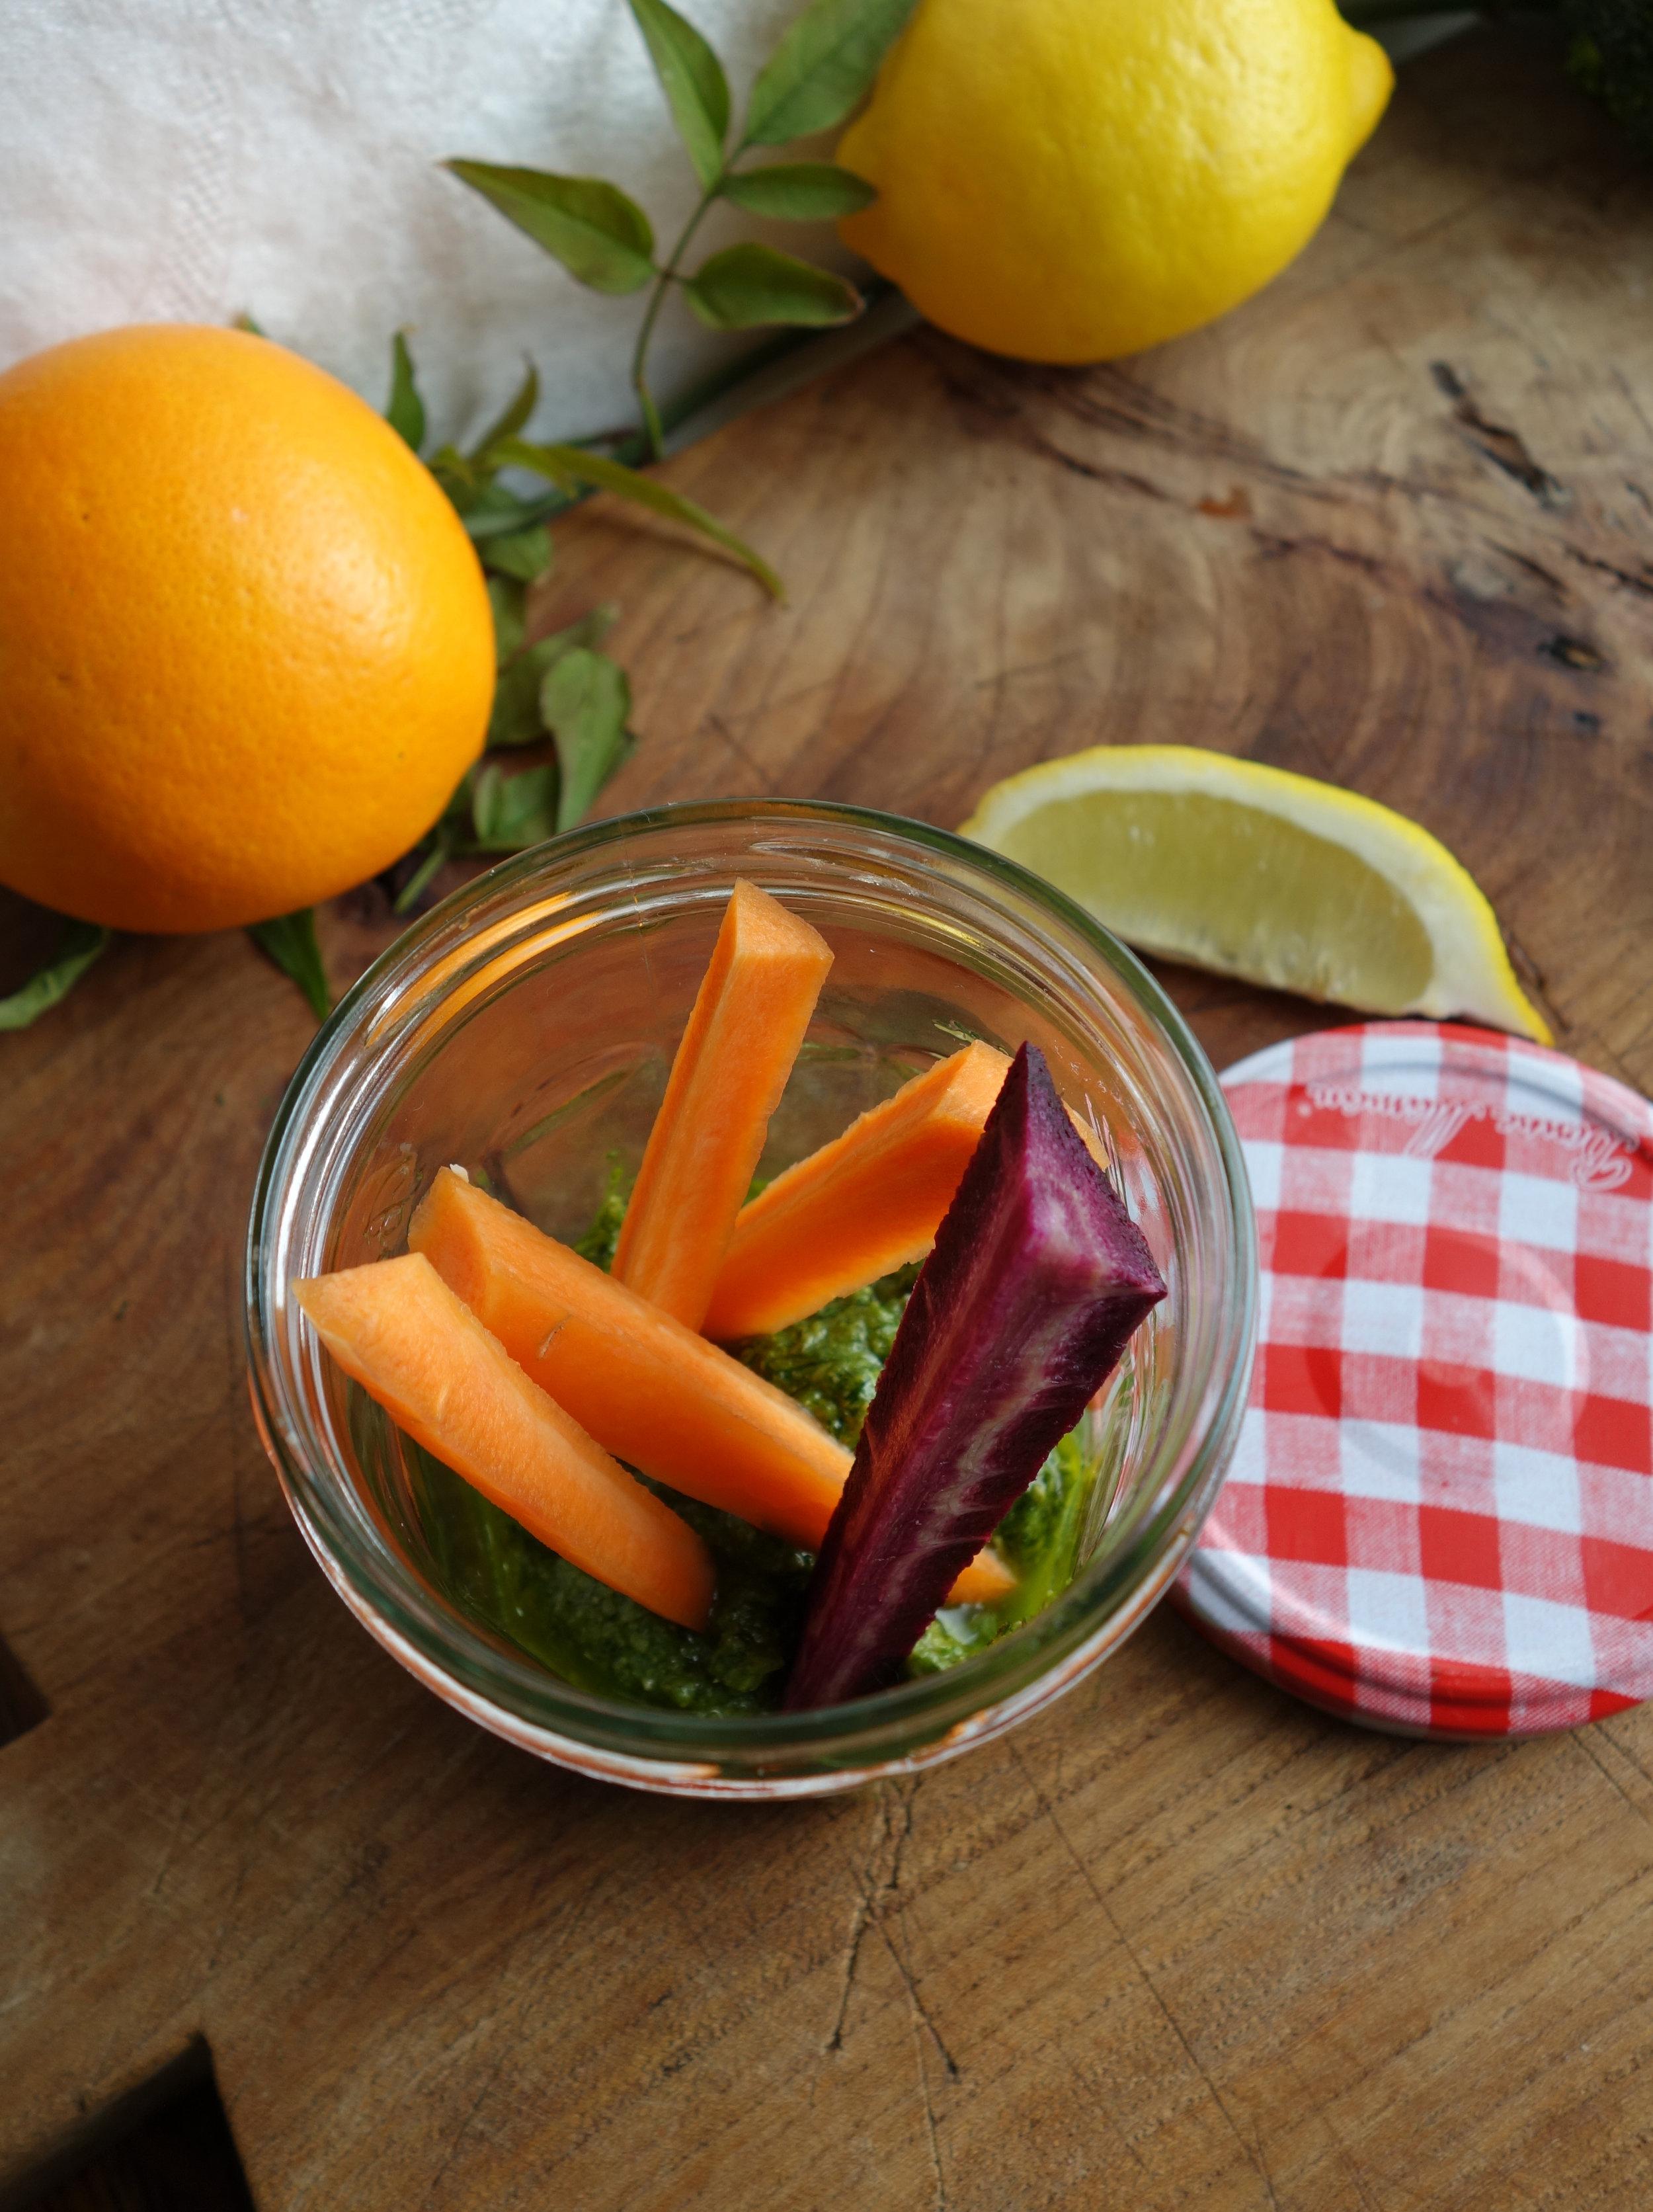 carrot sticks in glass jar